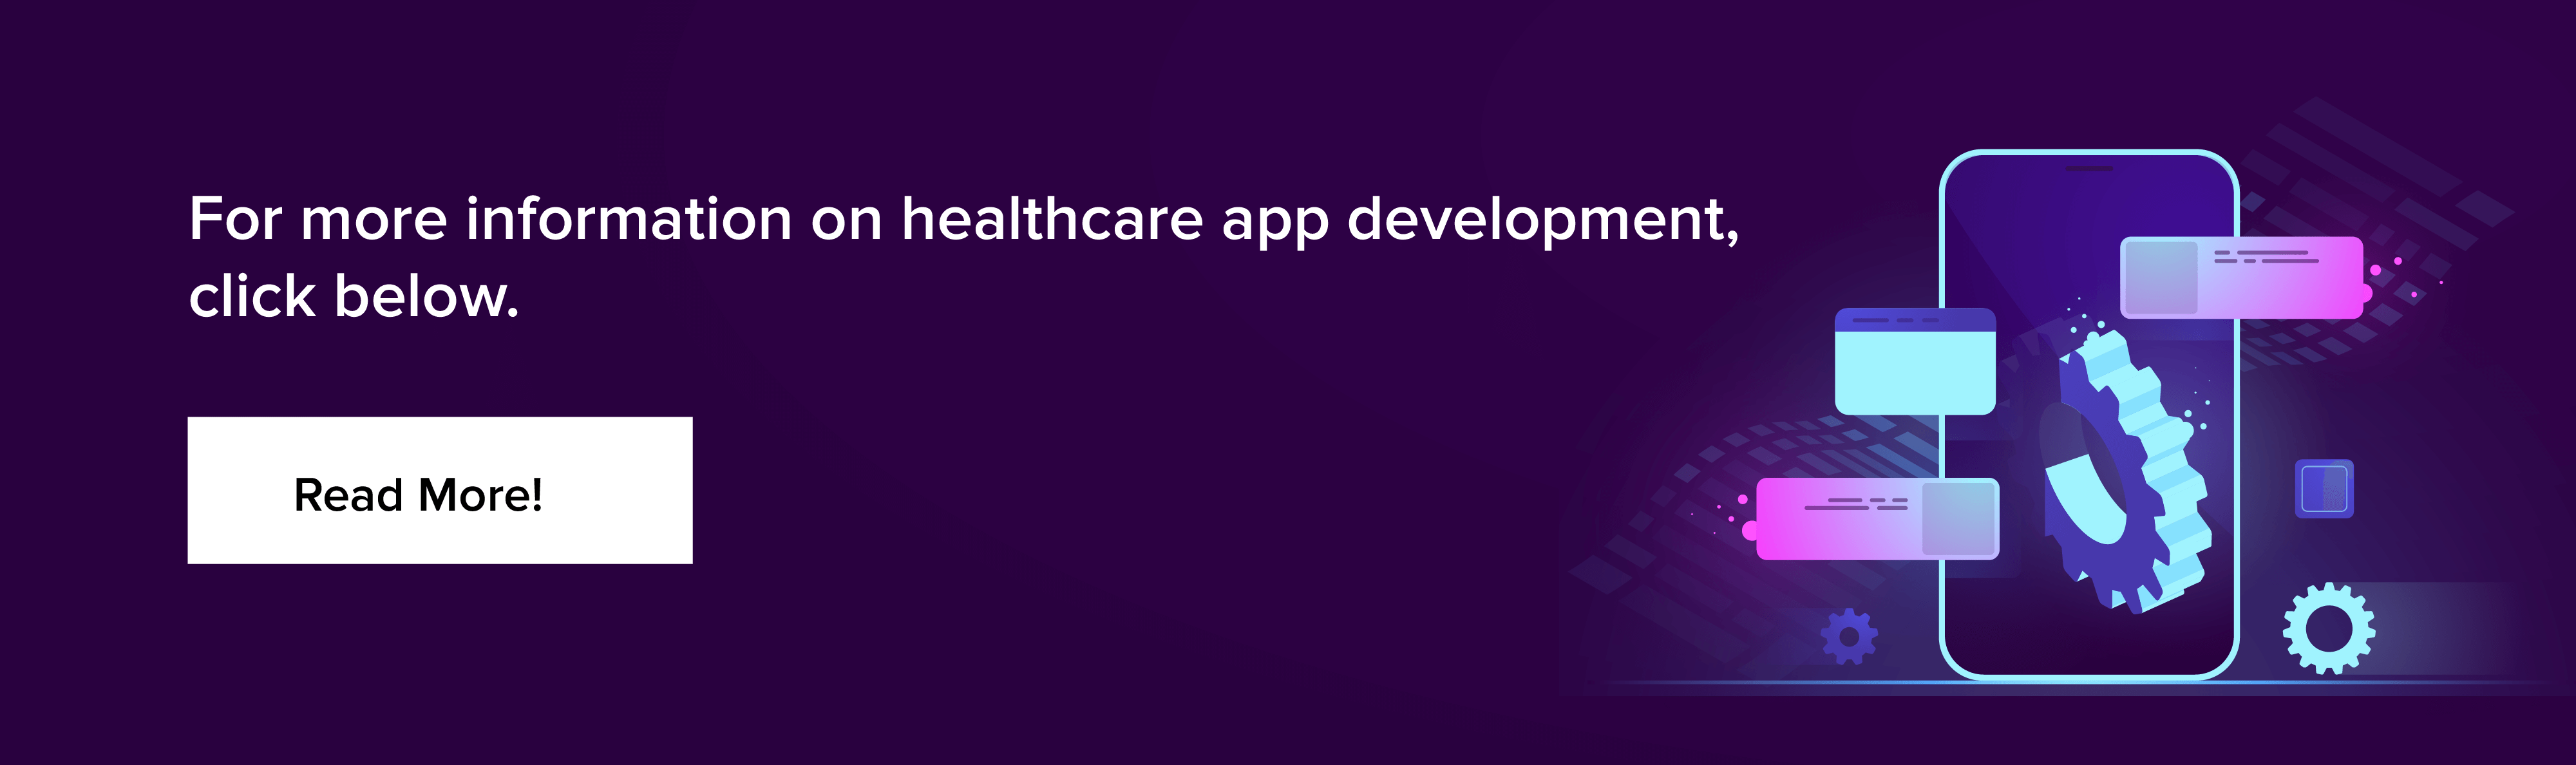 read more on healthcare app development